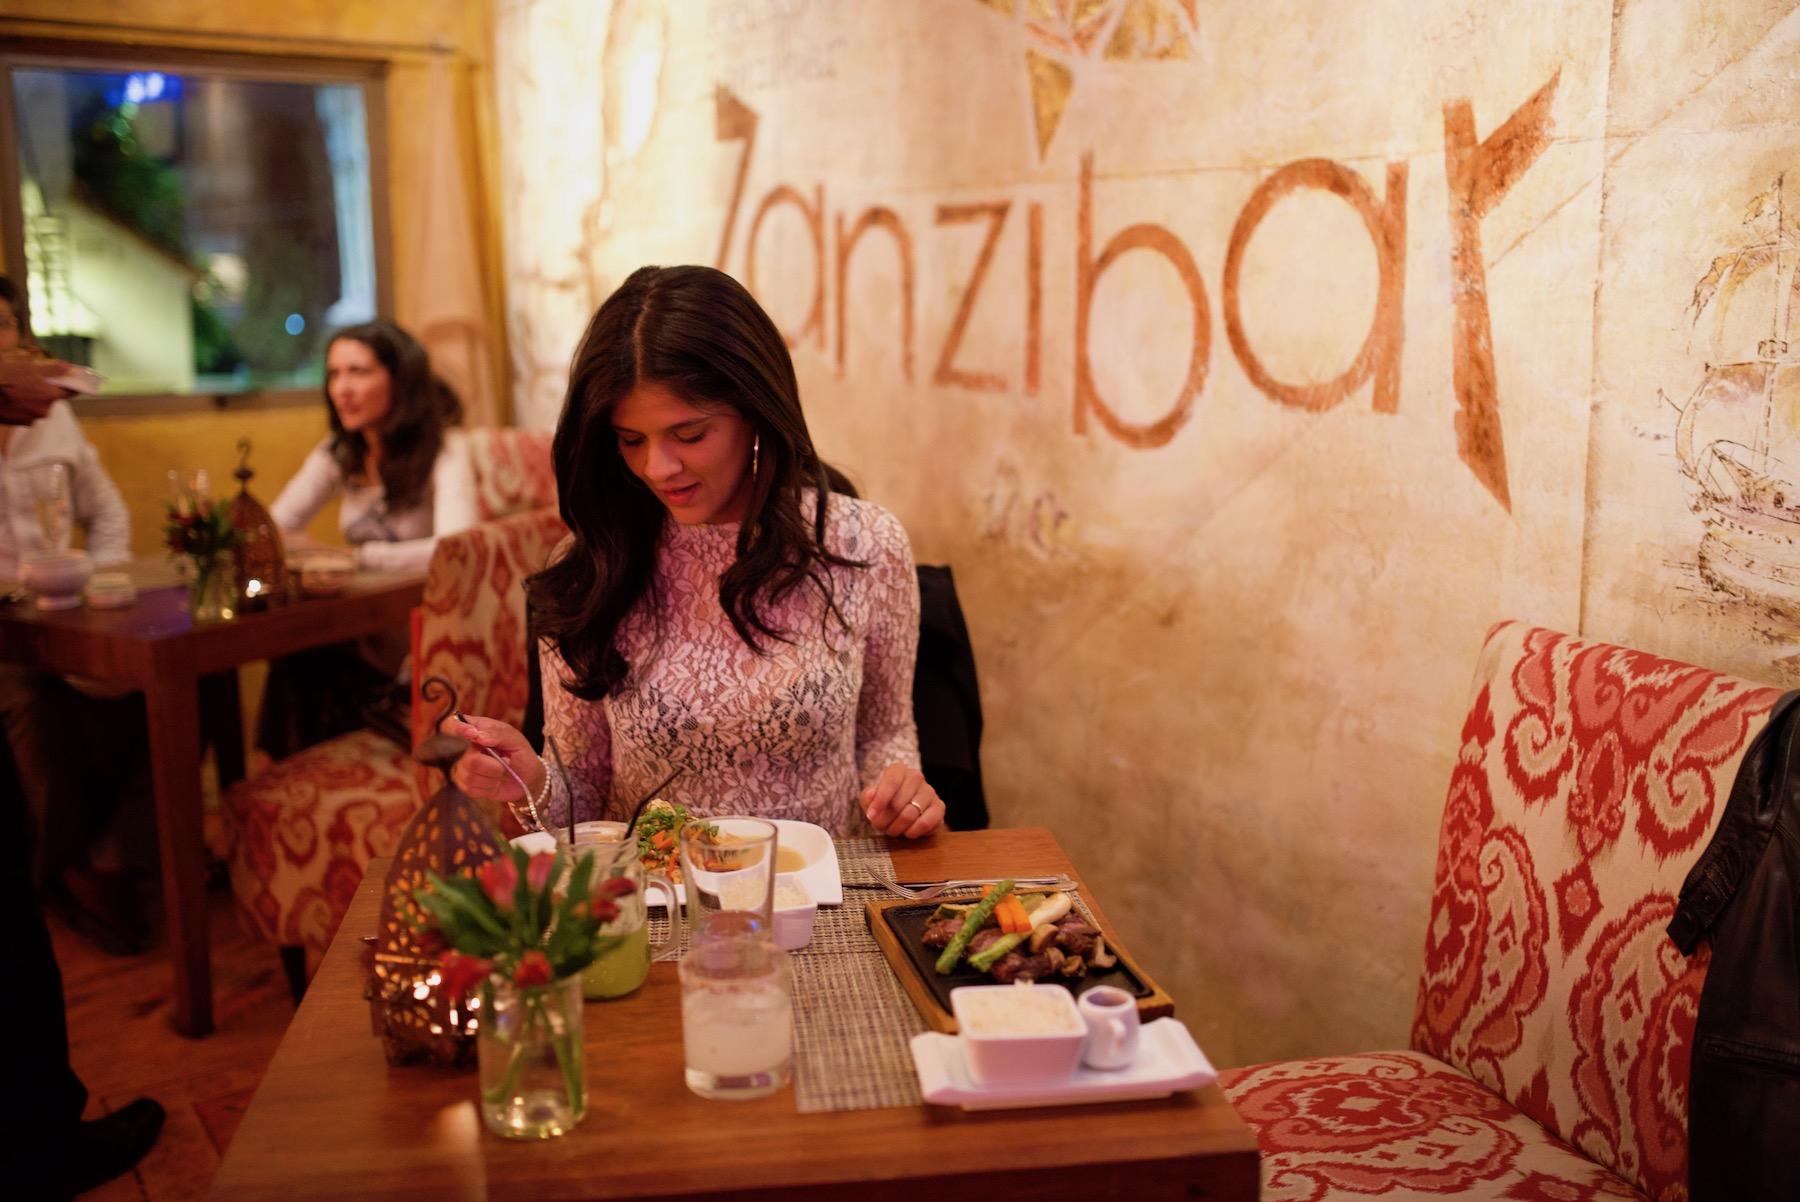 jantar-restaurante-zanzibar-santiago-chile-9